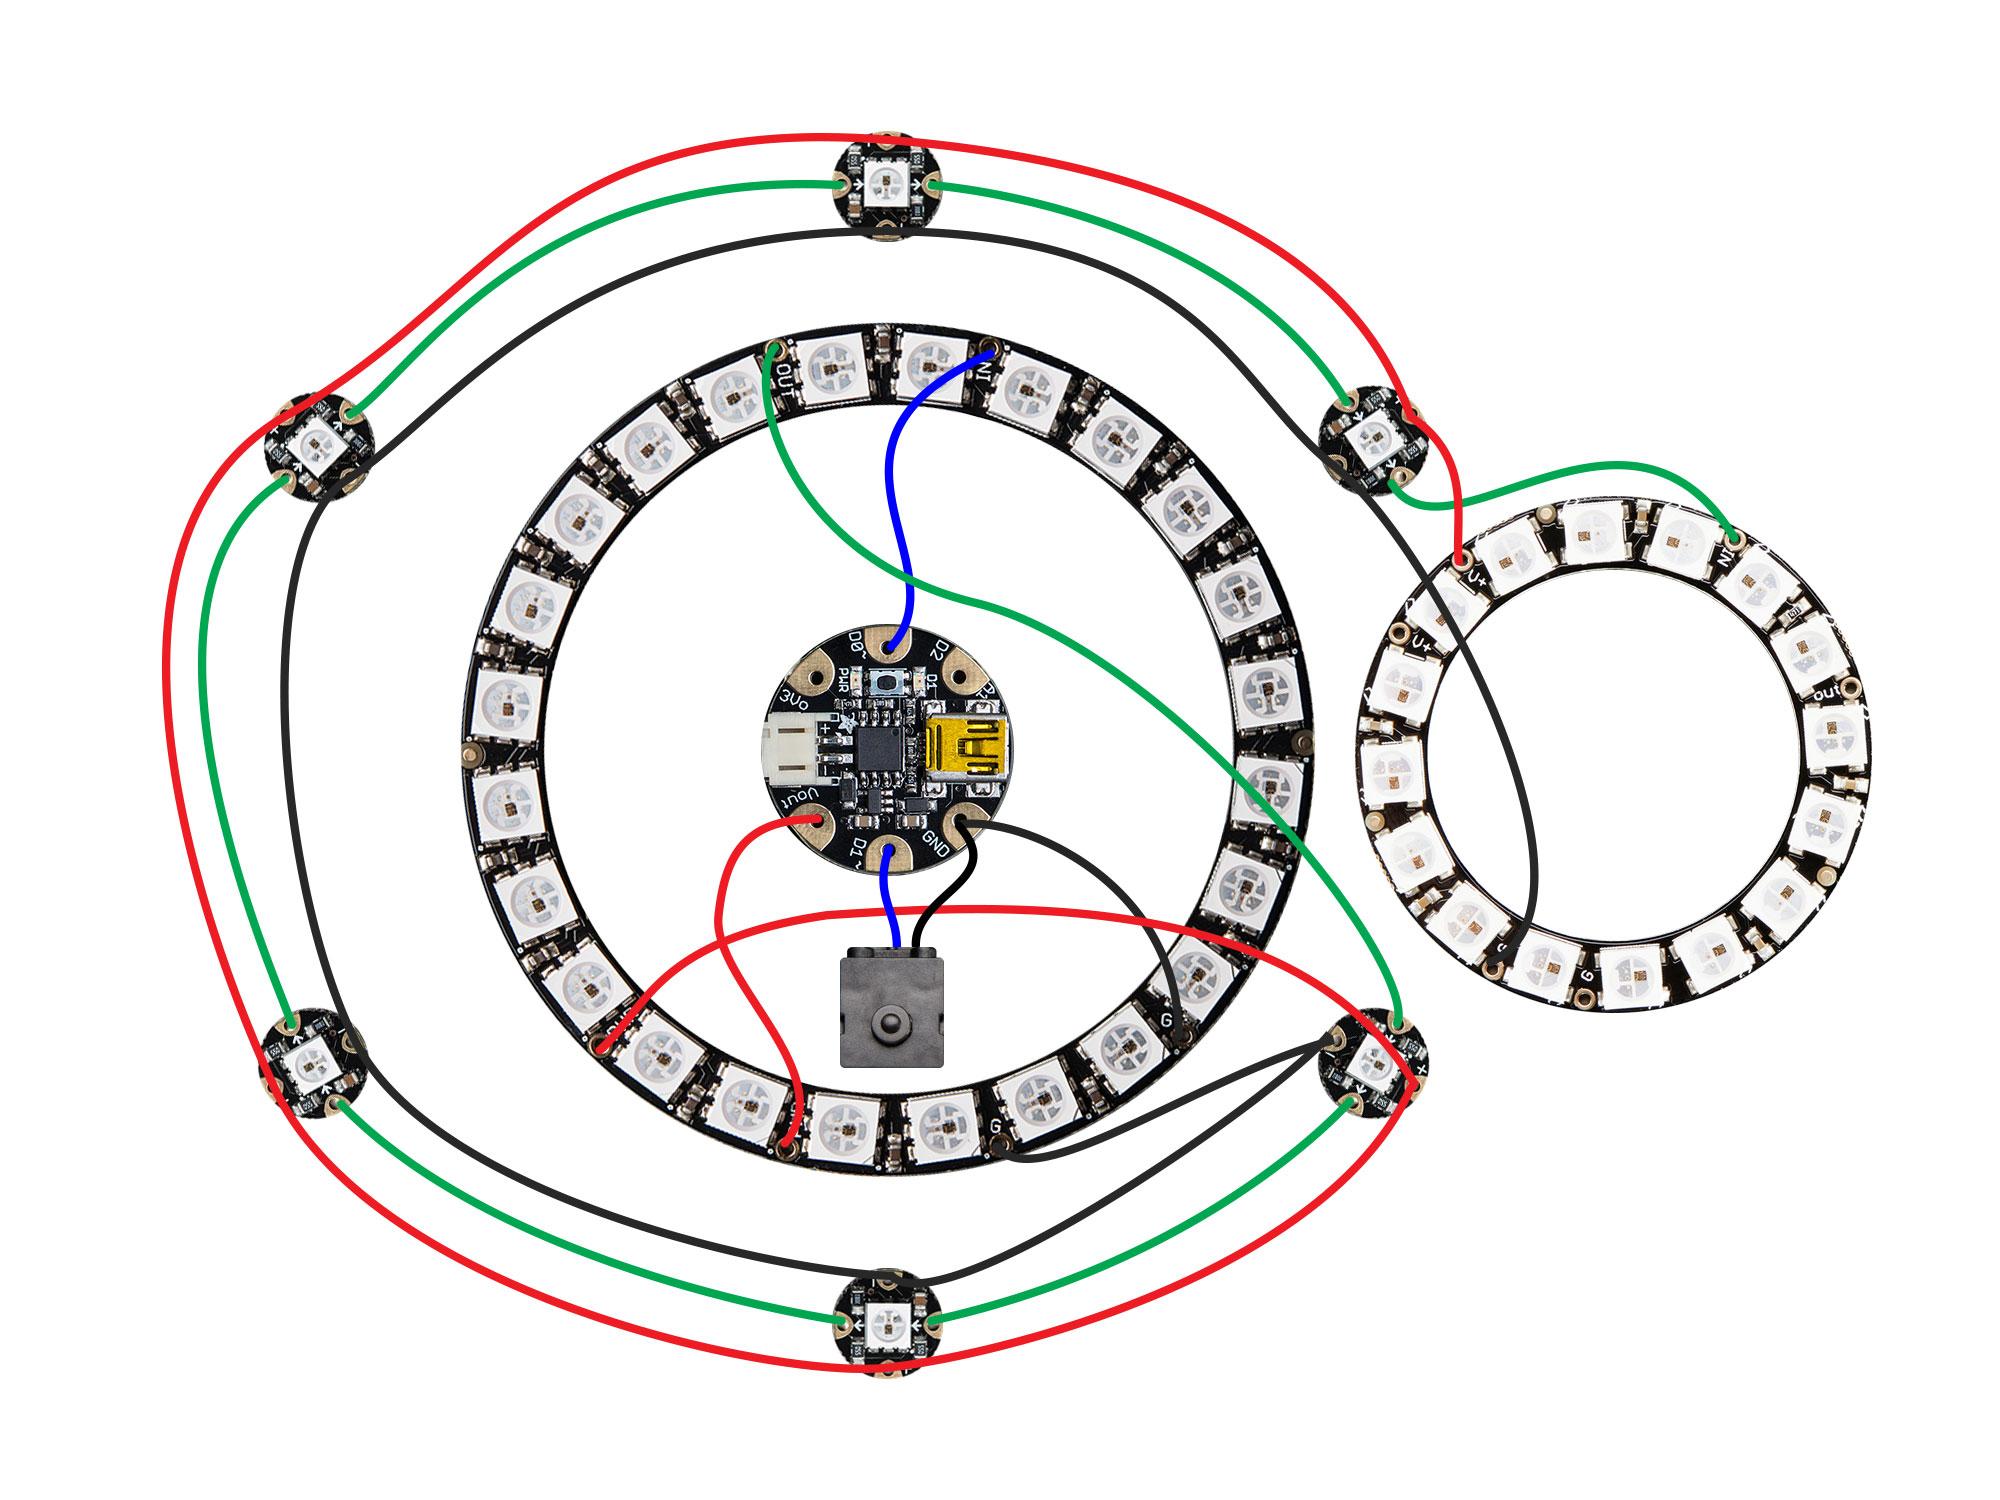 leds_uni-diagram.jpg